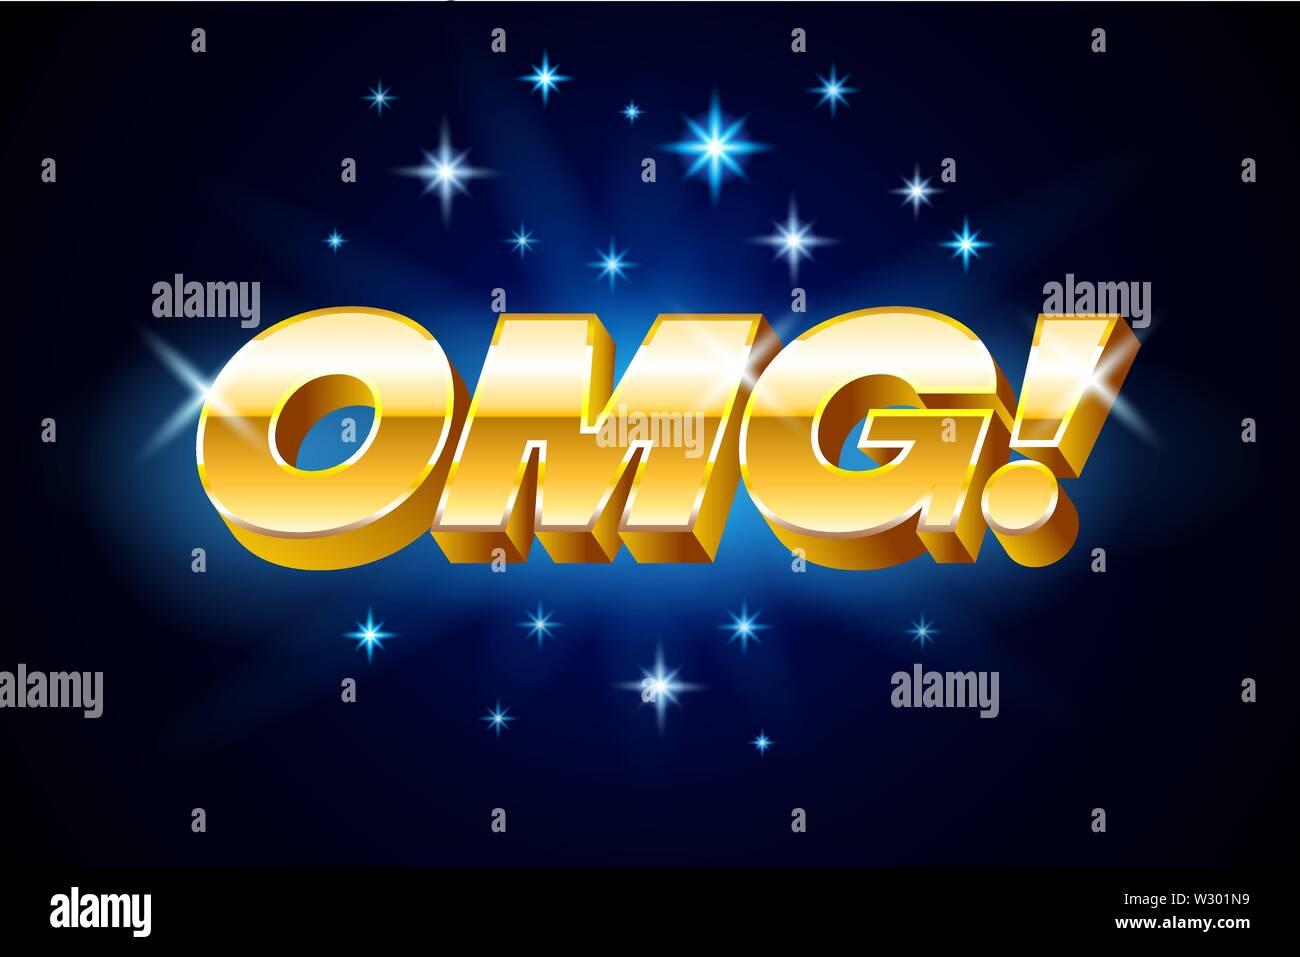 Gold omg inscription on blue background or banner with stars, emotion expression, vector illustration. Stock Vector